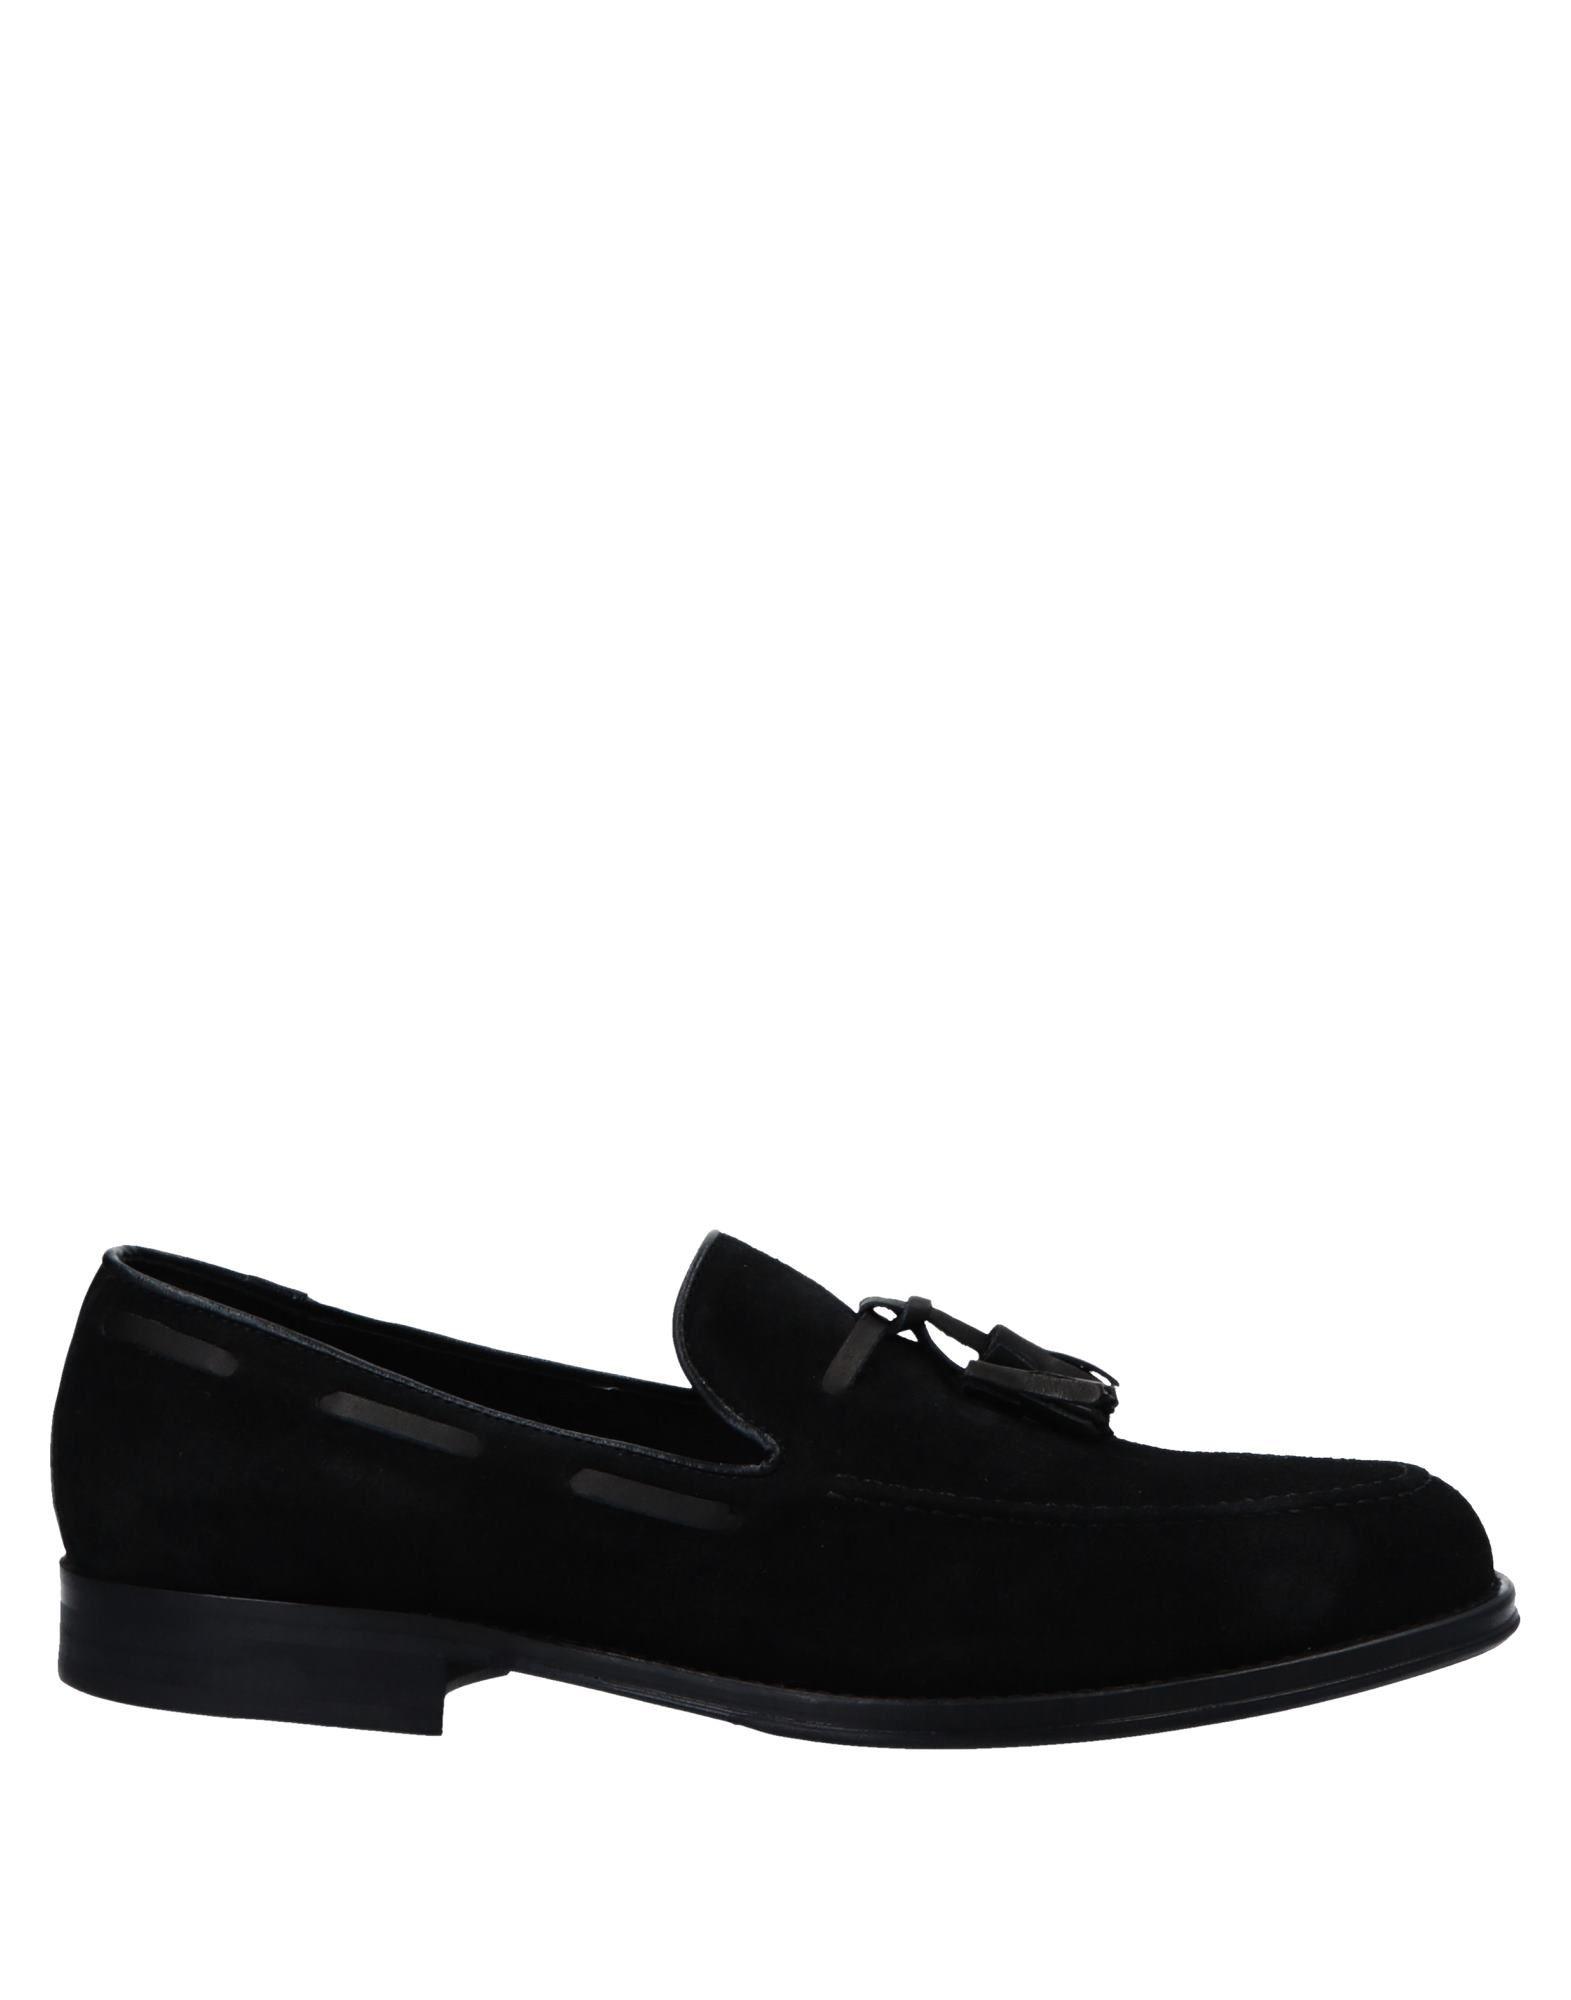 Gianfranco Lattanzi Mokassins Herren  11547043OM Gute Qualität beliebte Schuhe